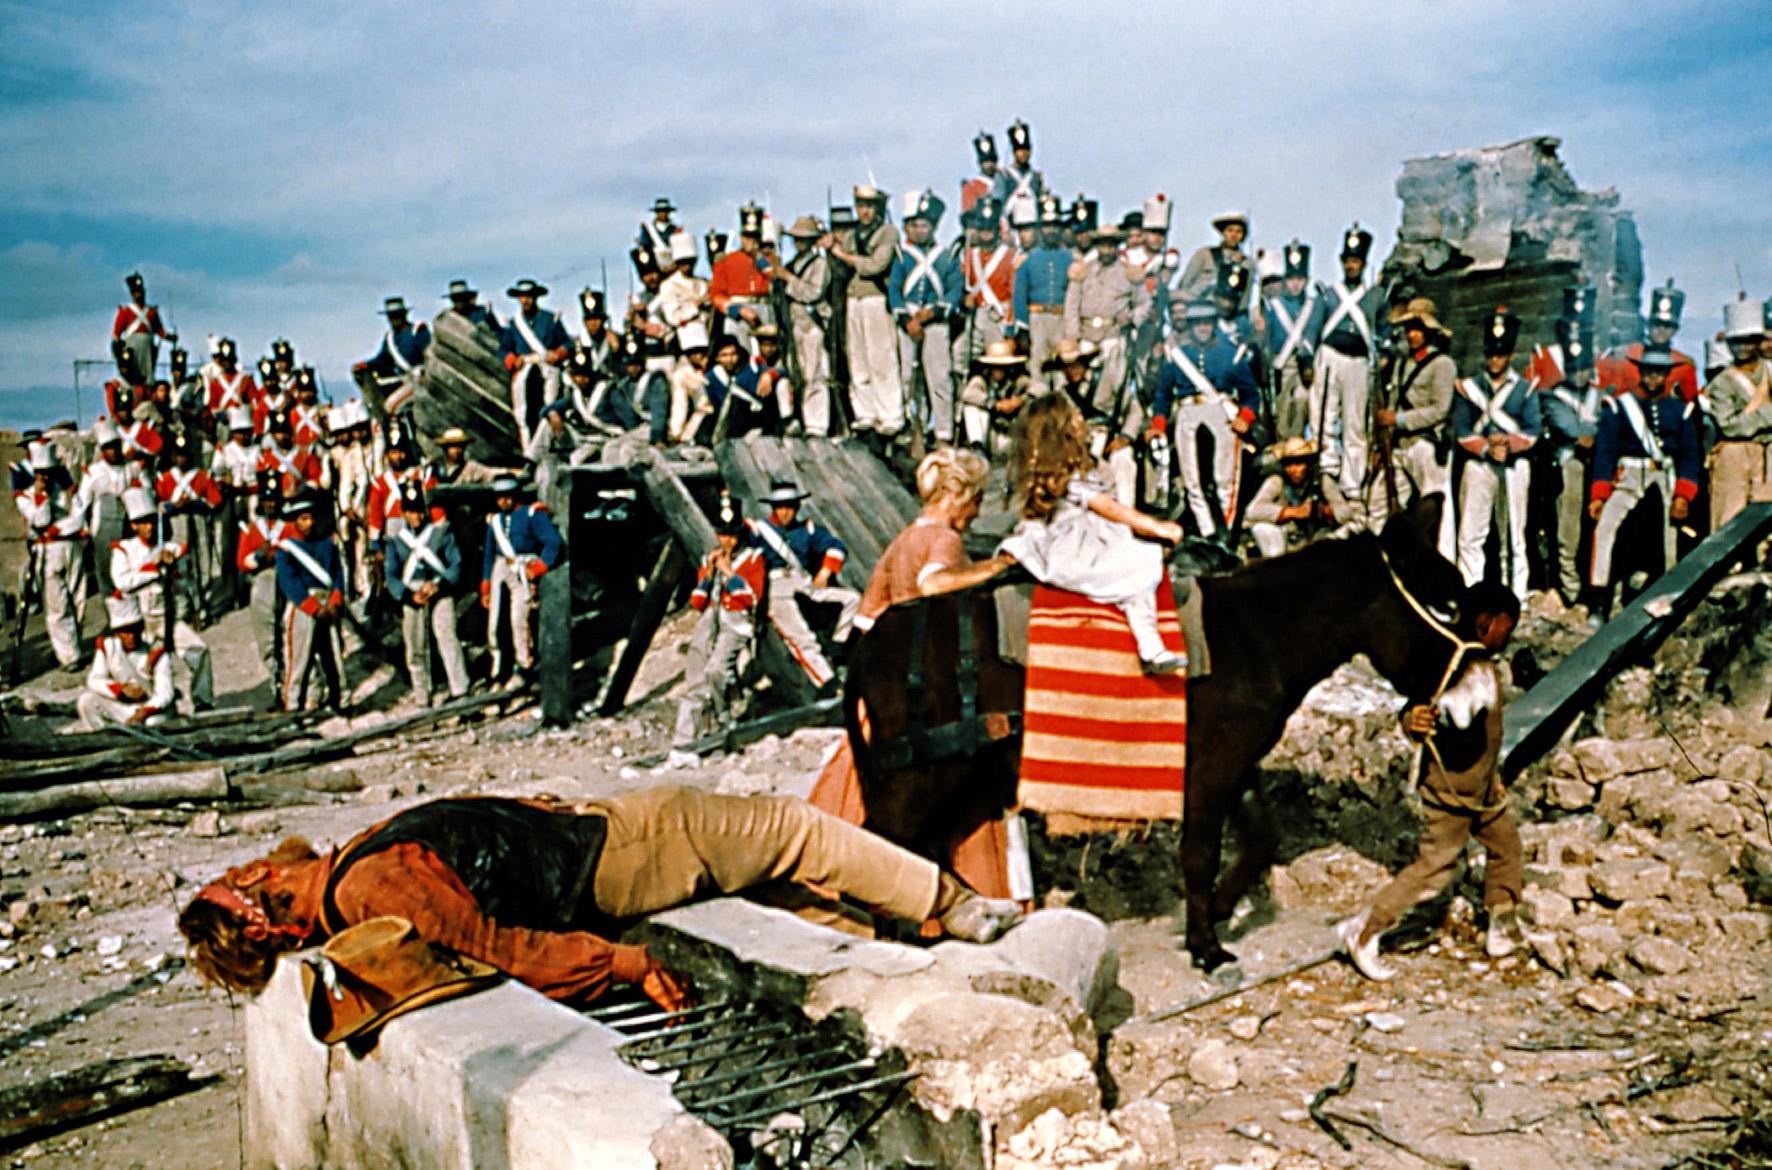 Zur arte-Sendung am 01. Januar 2000 um 20.50 Uhr Alamo 5: v.l.n.r. Richard Widmark (Jim Bowie), John Wayne (Davy Crockett) und Laurence Harvey (Colonel William Travis) Fotos: ARTE FRANCE